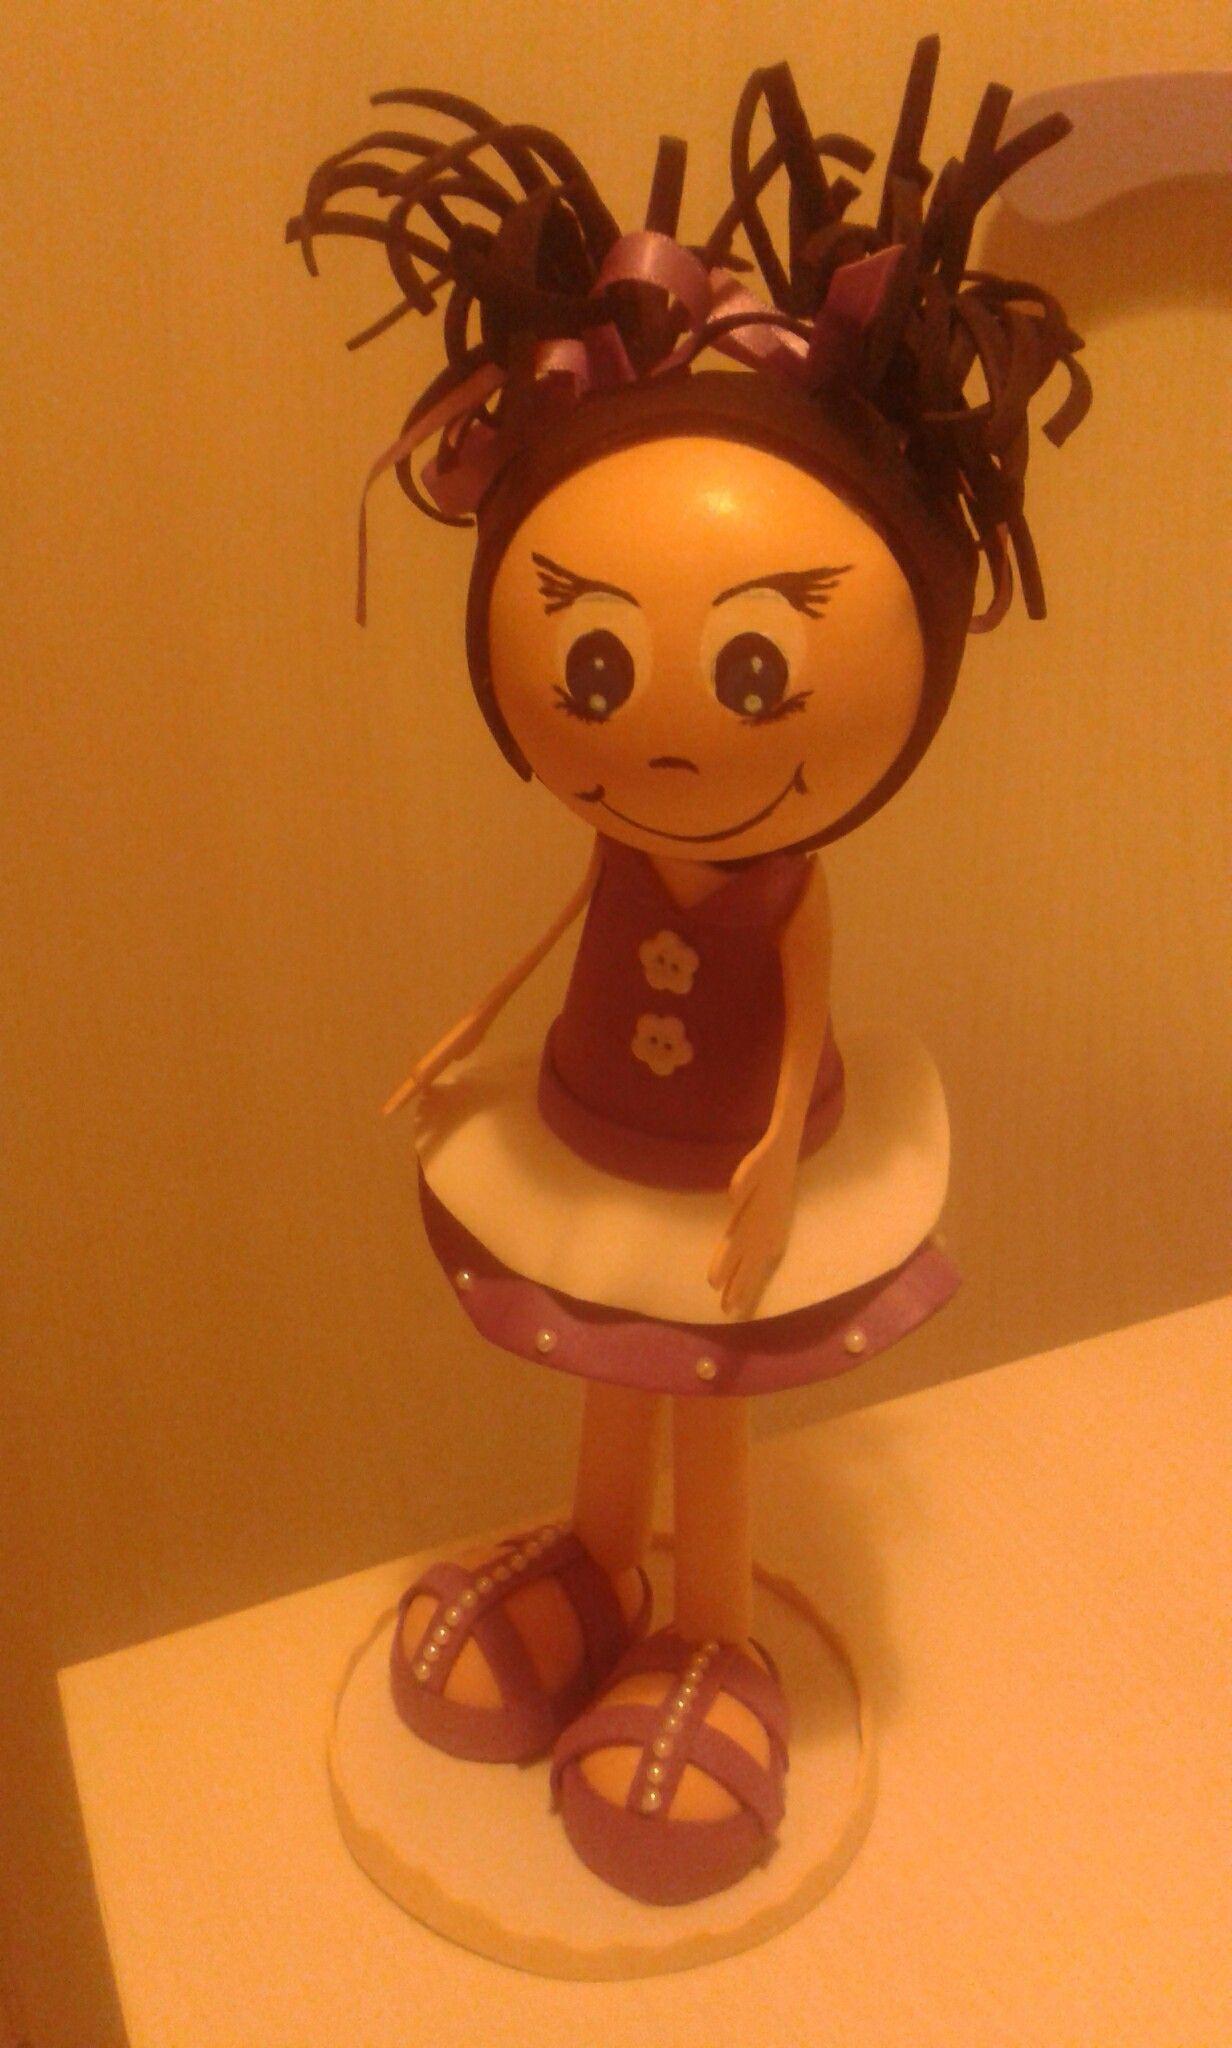 Bambola in moosgummi